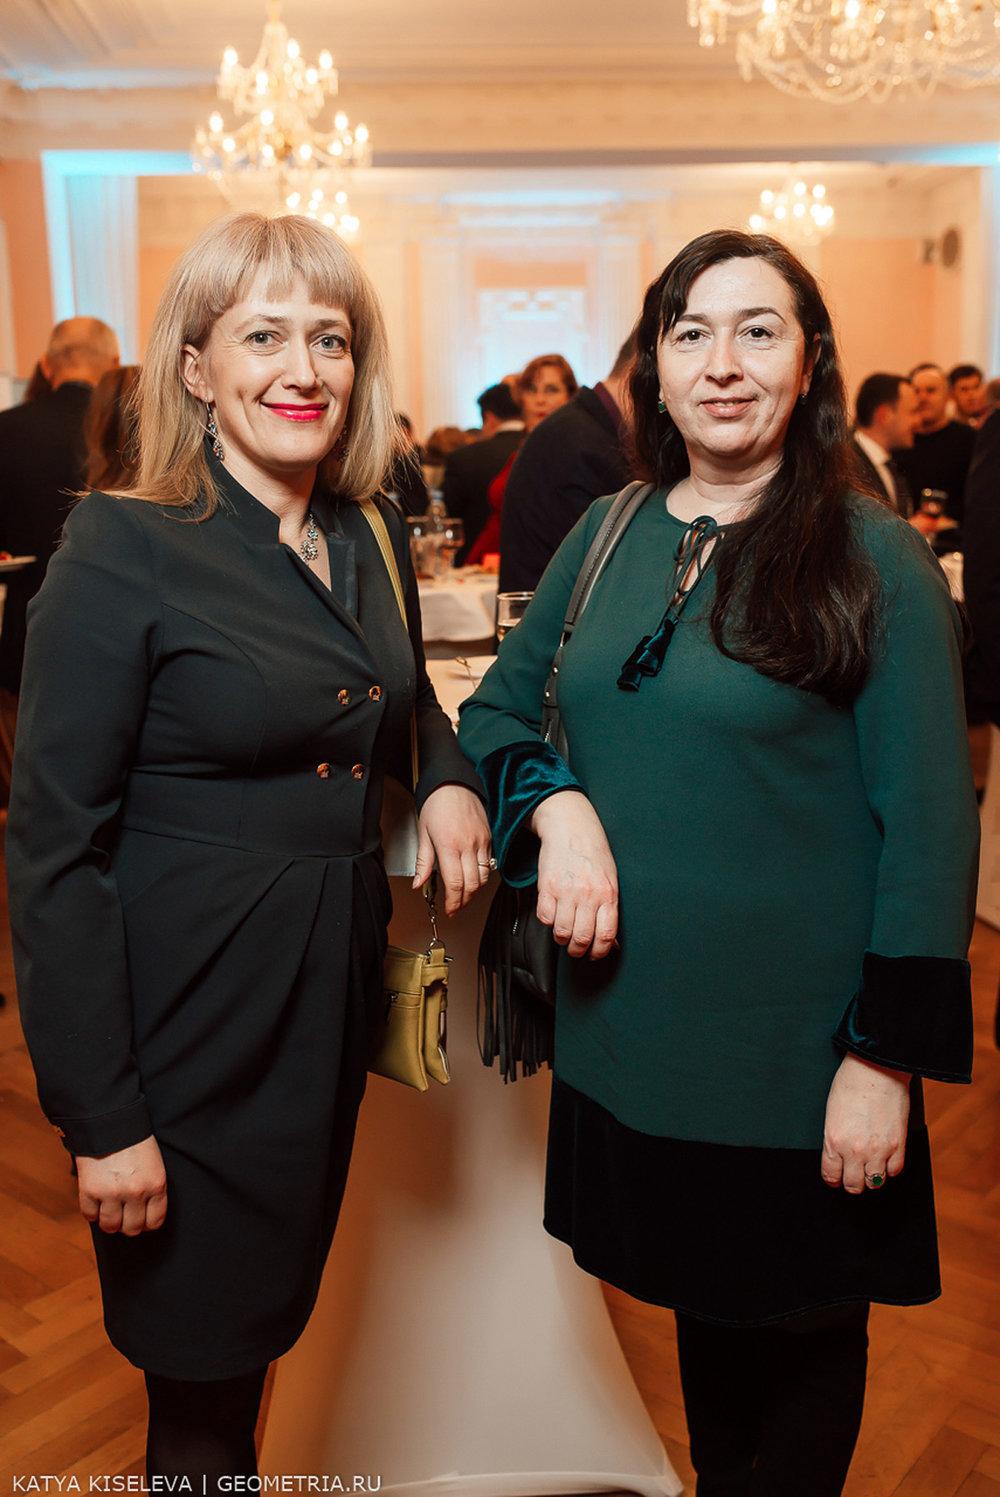 116_2018-02-14_19-10-21_Kiseleva.jpg